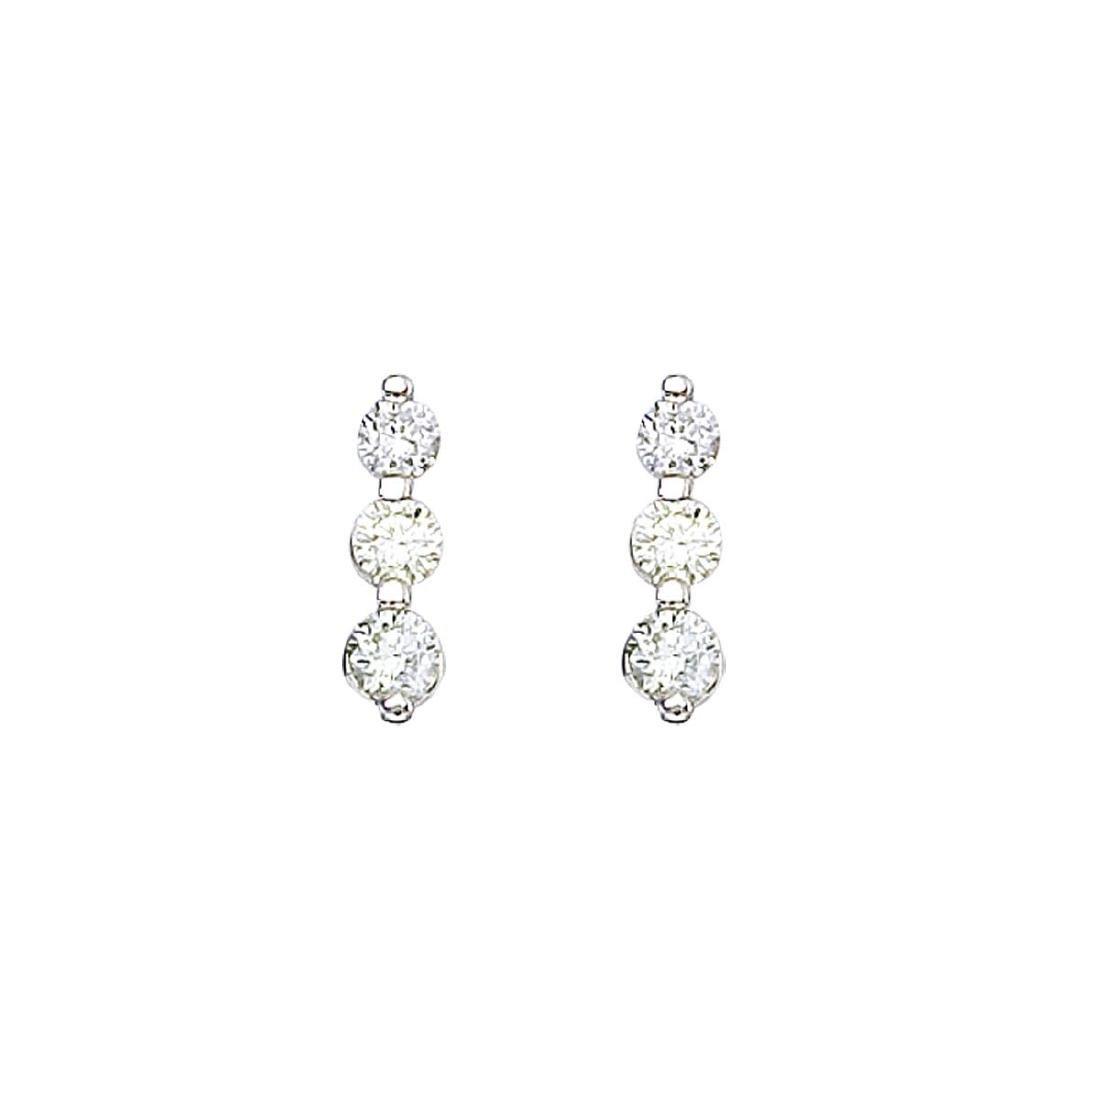 Certified 14k White Gold .50 ct 3 Stone Diamond Earring